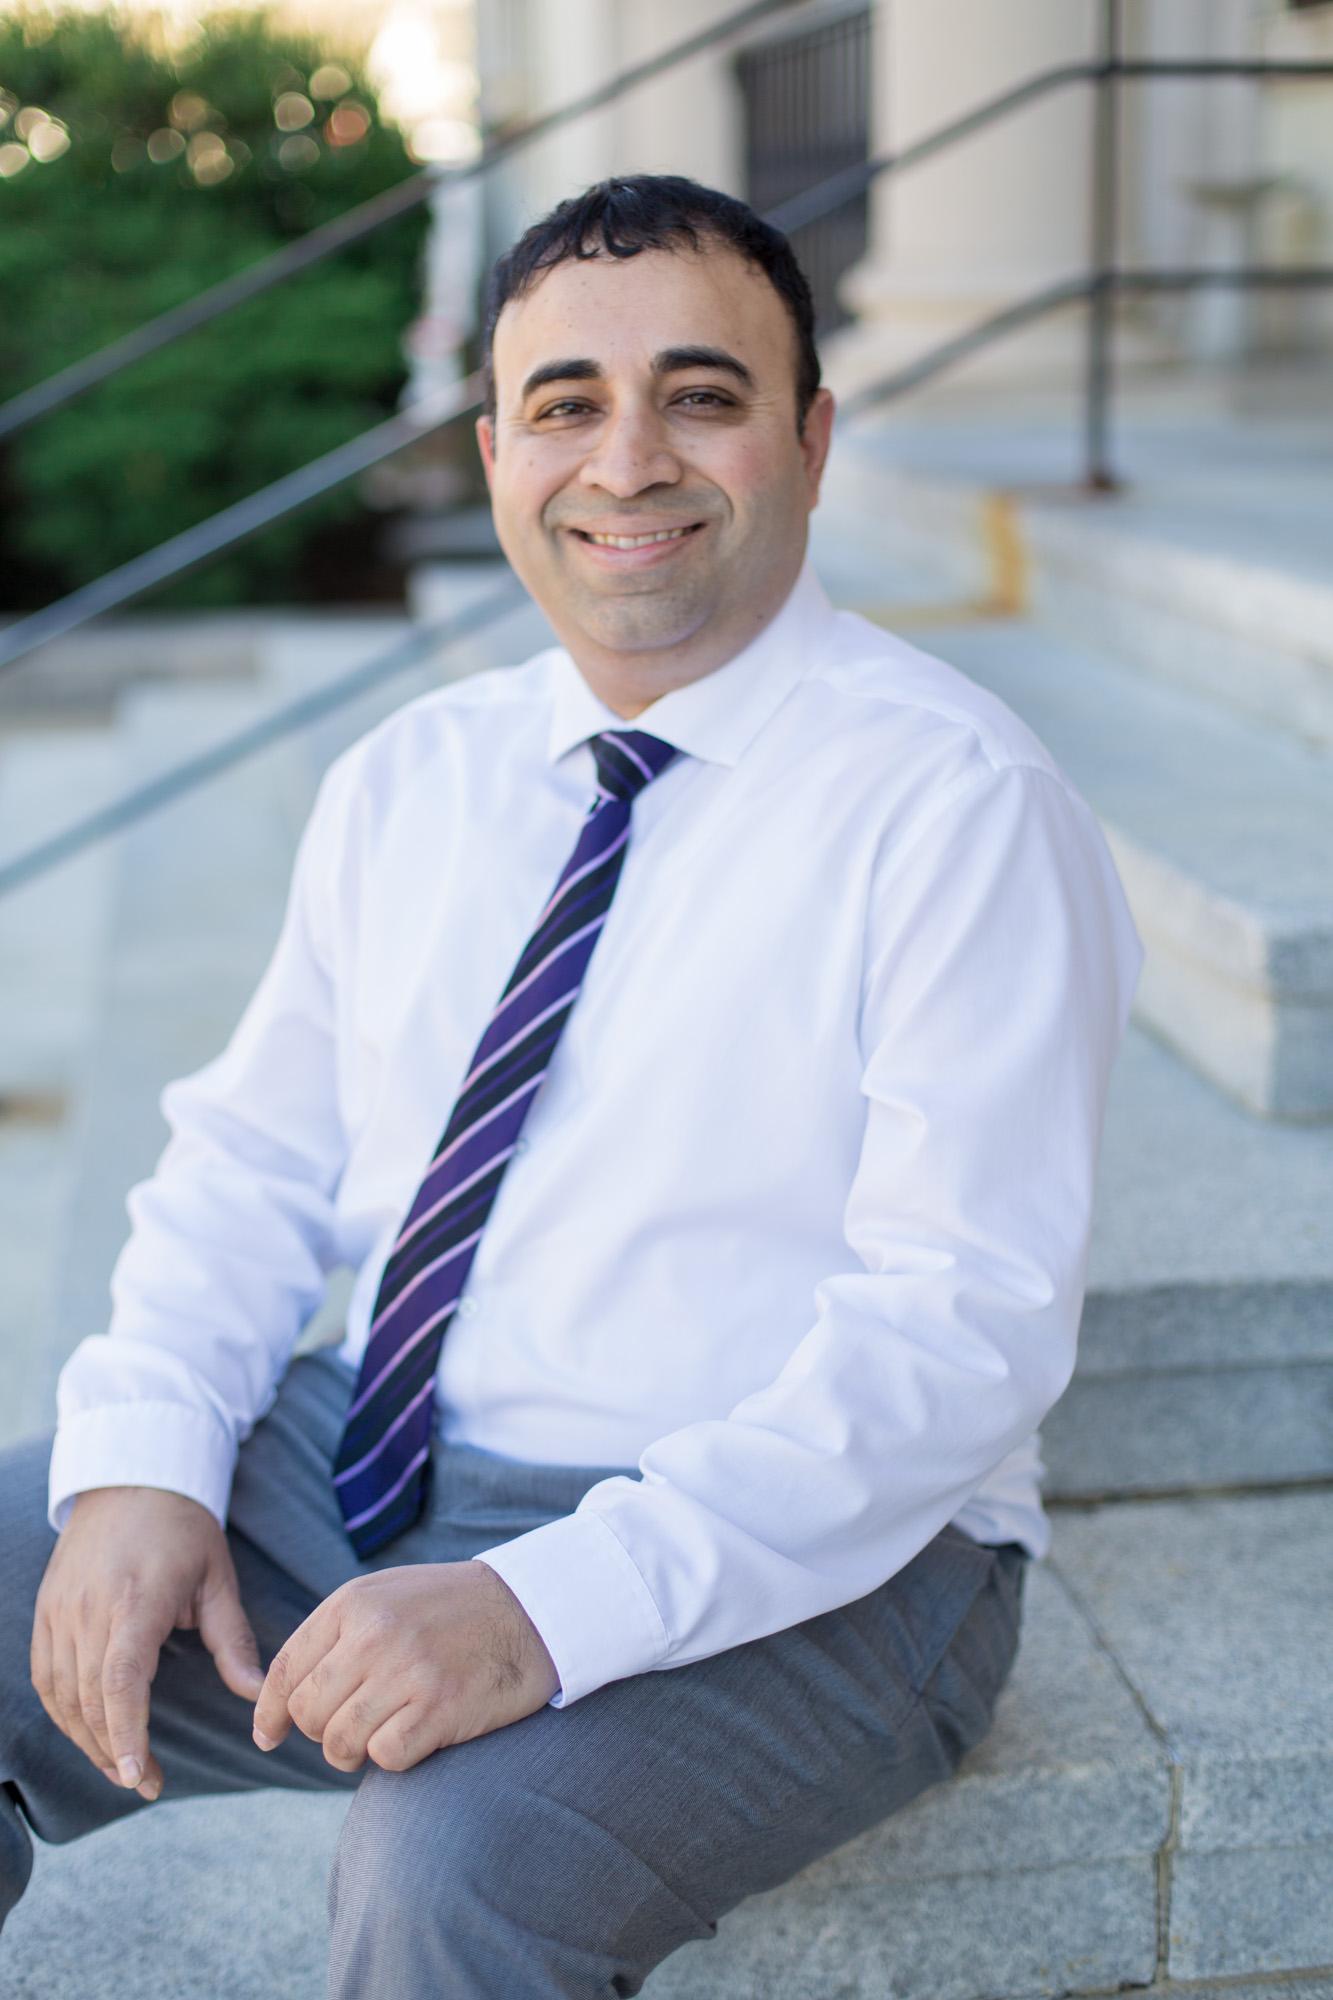 Headshots for Dr. Vikas Gupta | Greenville NC Headshot Photographer | Bryant Tyson Photography | www.memoriesbybryant.com